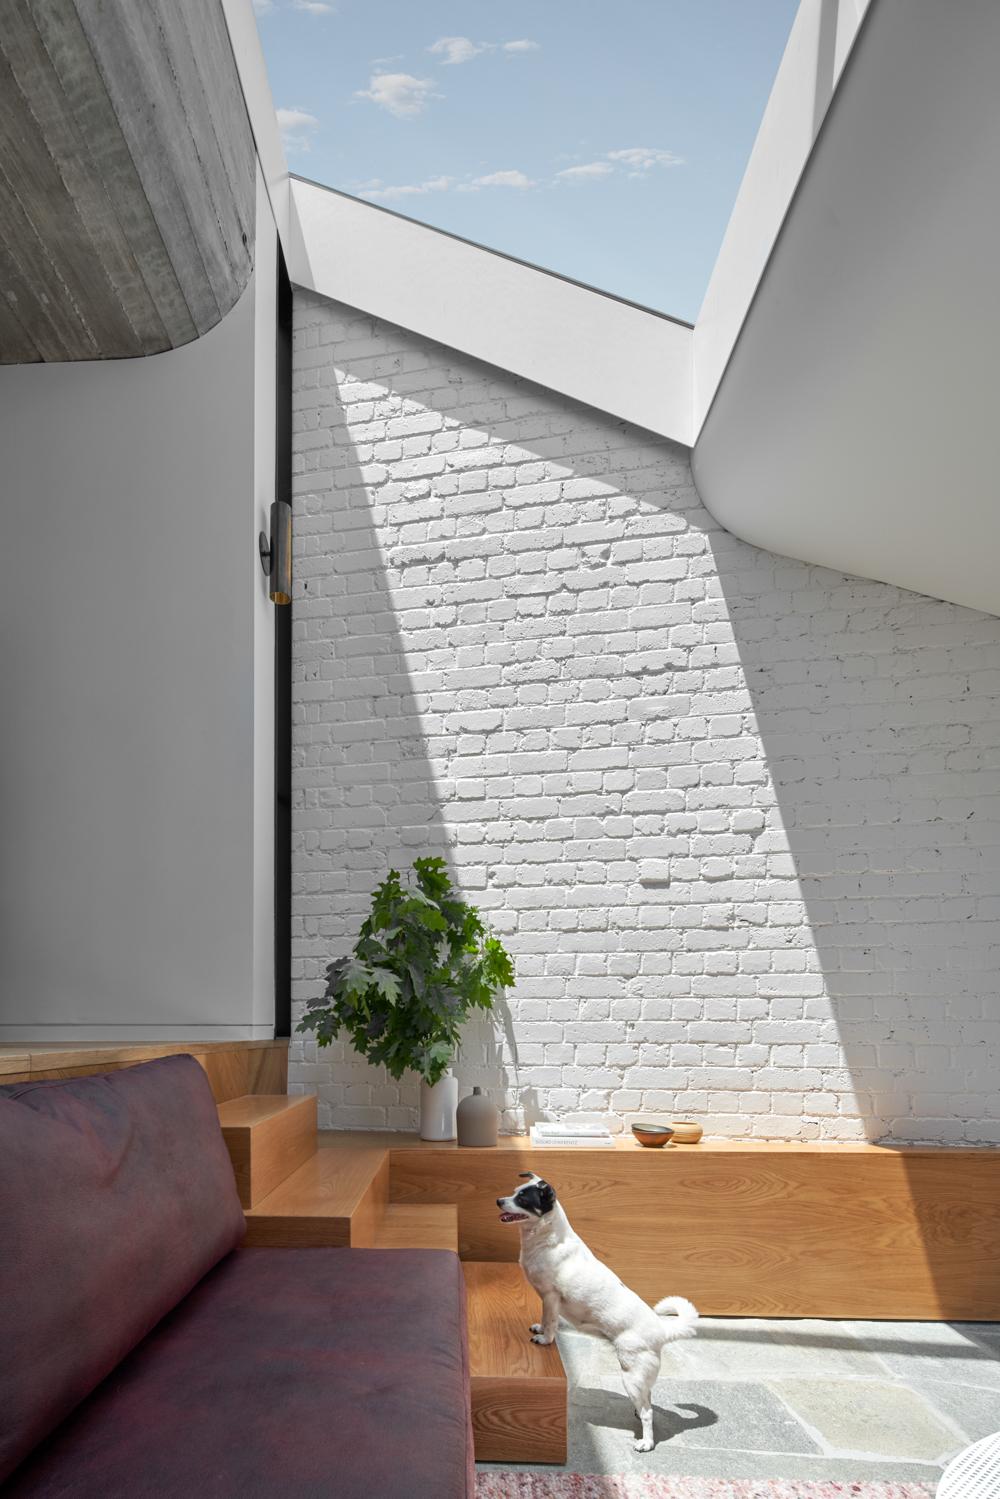 Skylight design